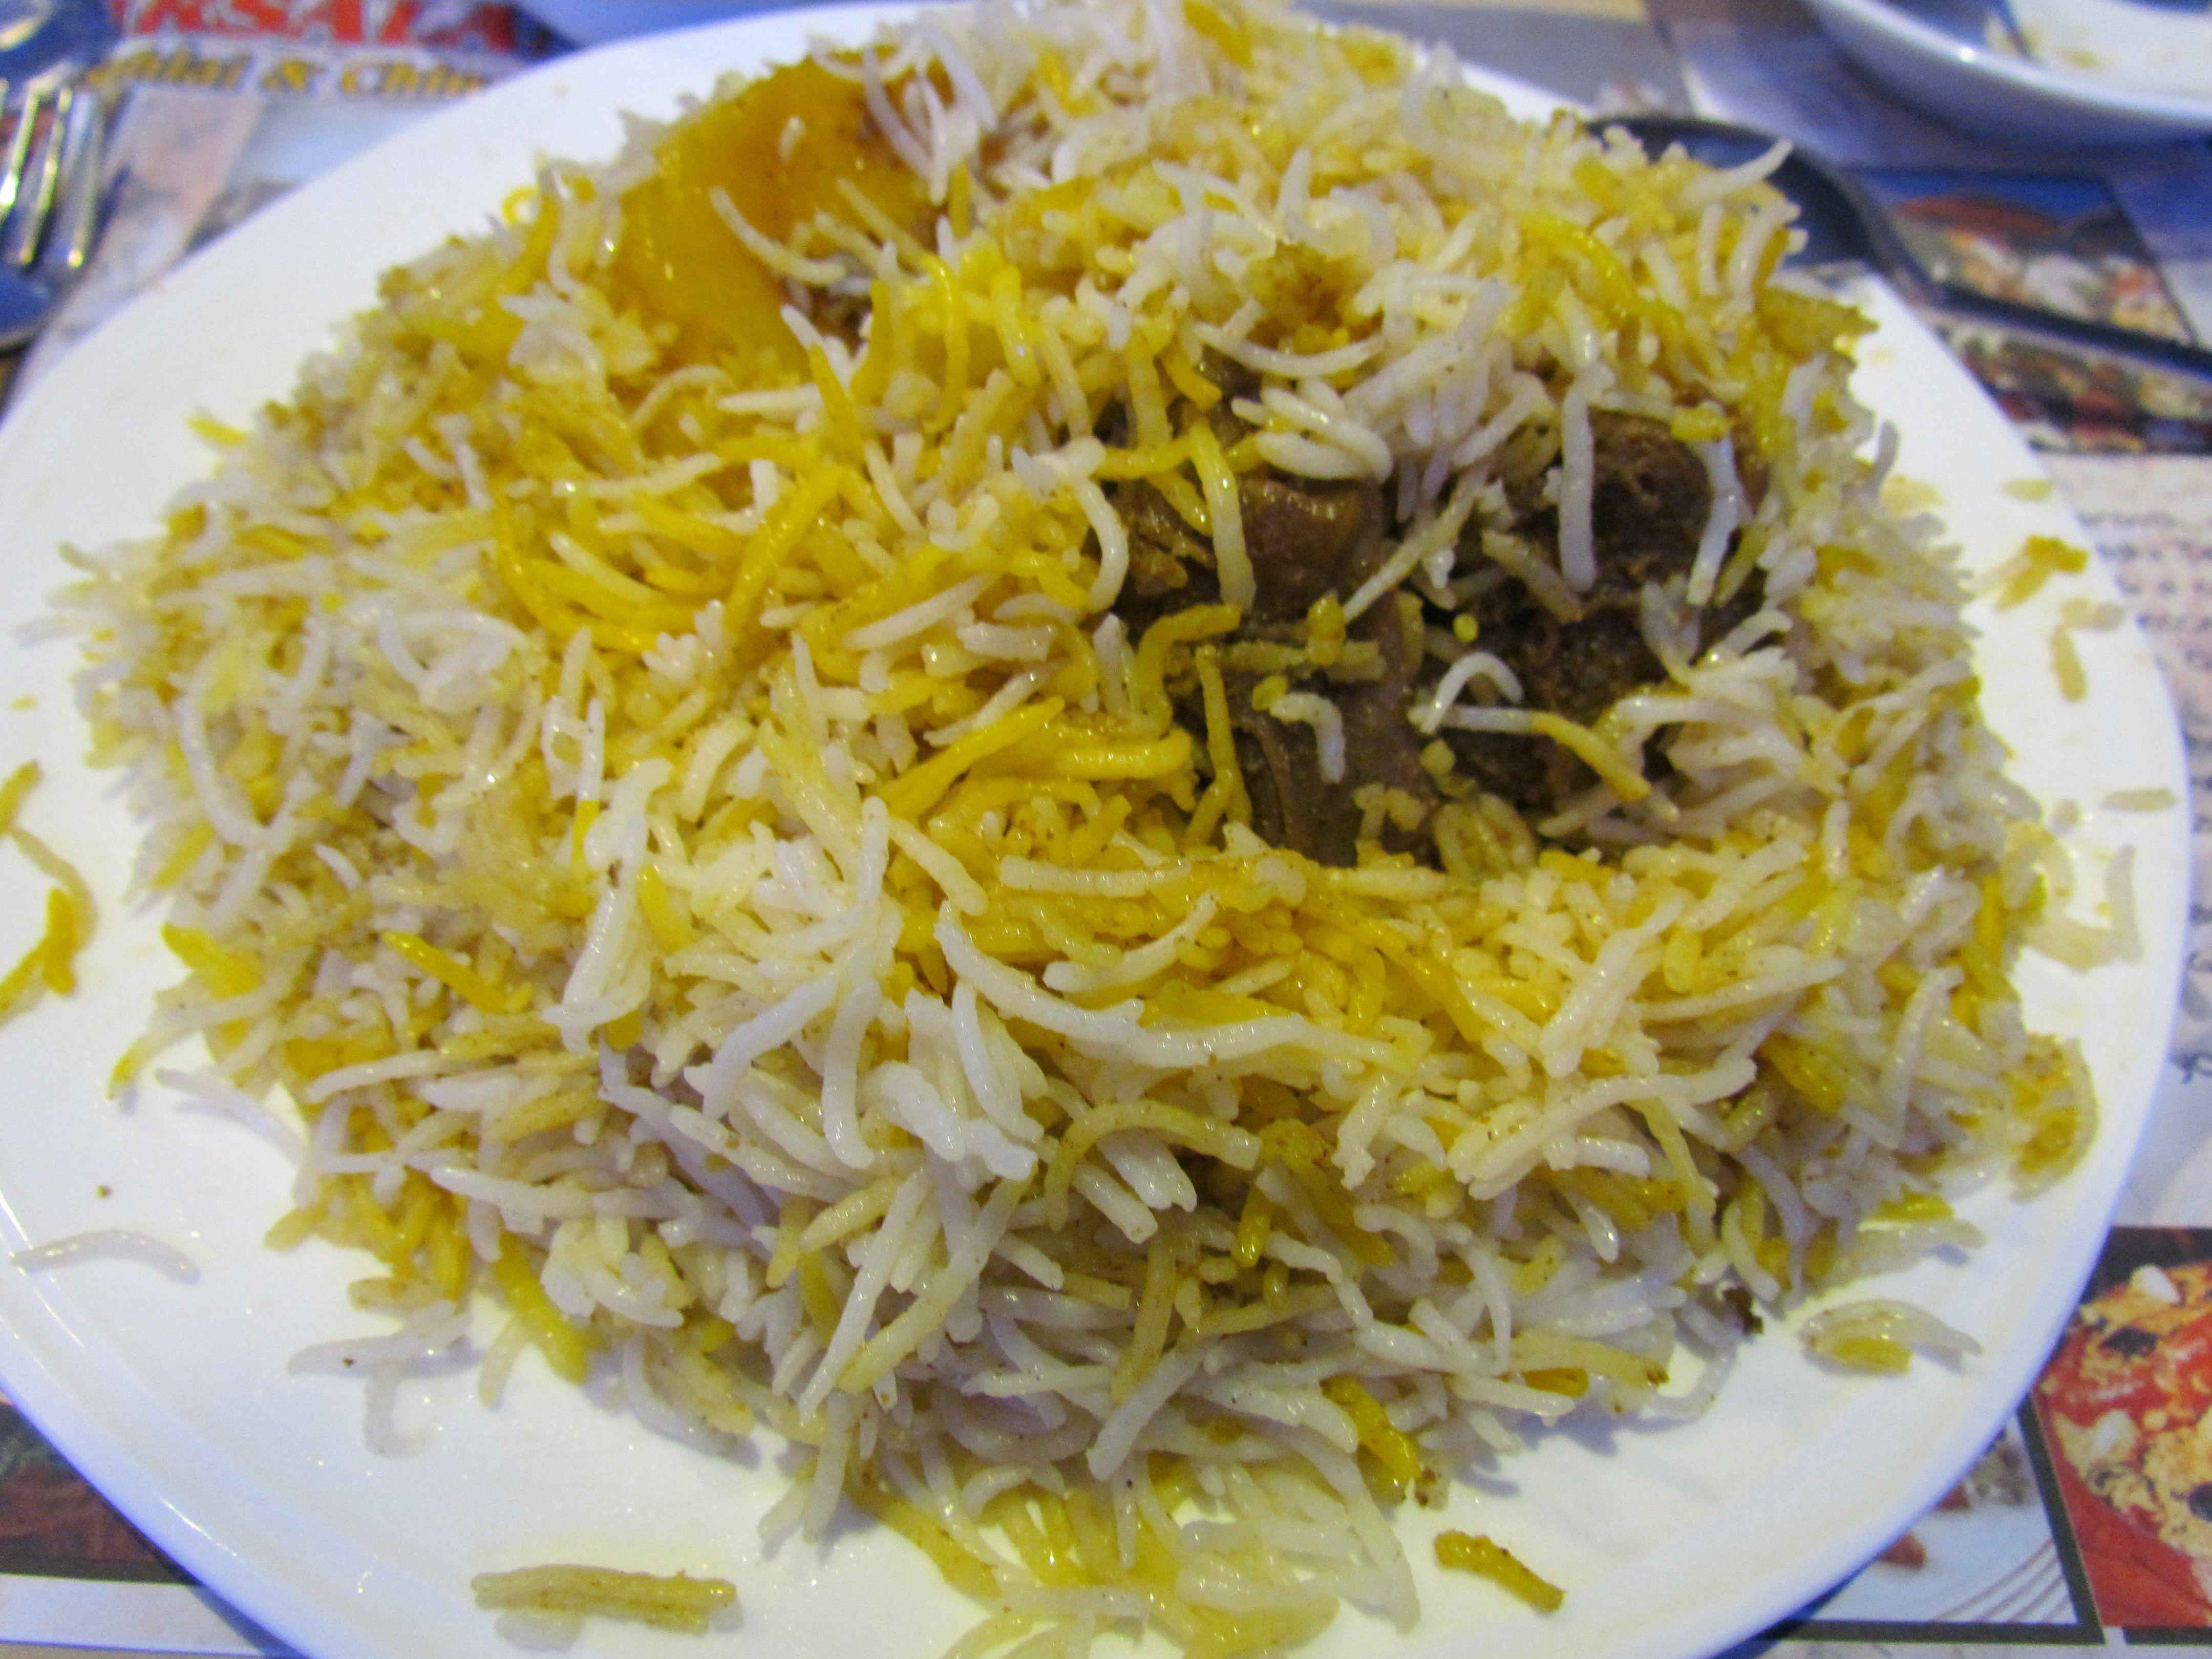 Arsalan Mutton Biryani Google Search Food Bandeng Presto Box By Susenopresto